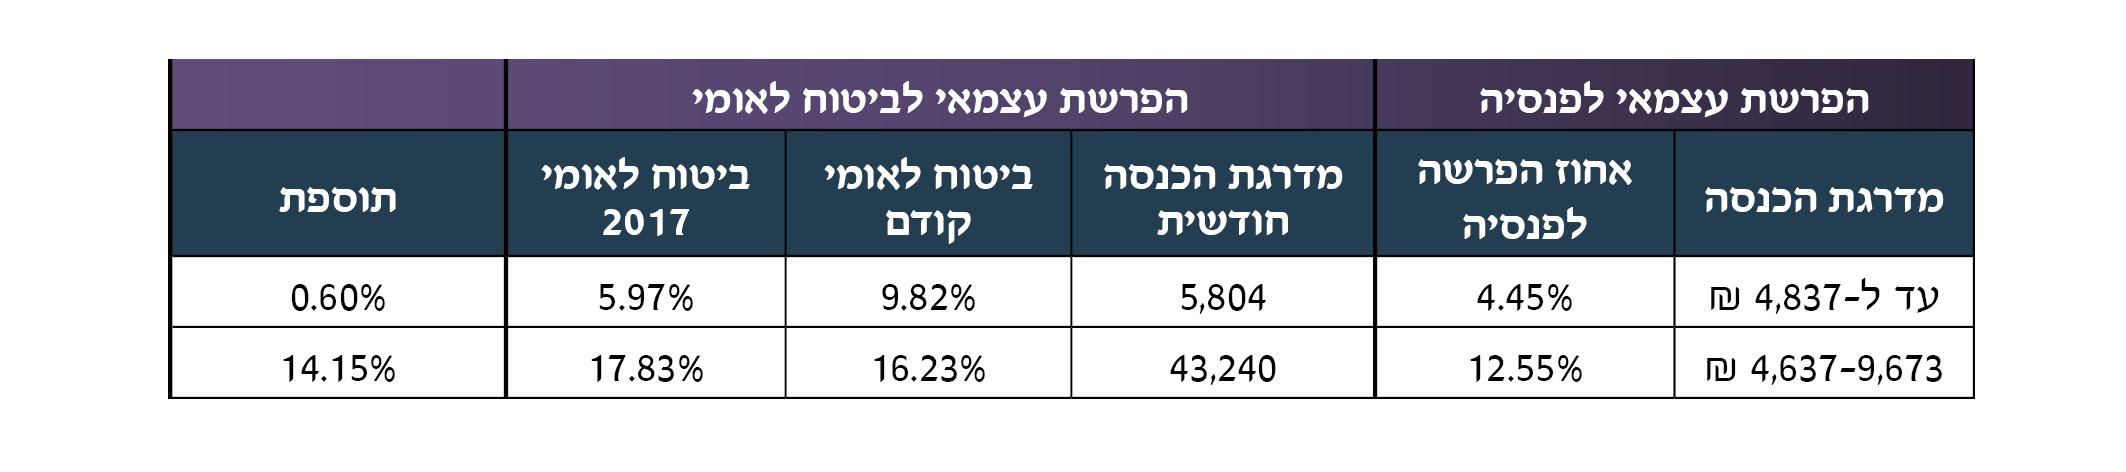 %d7%94%d7%a4%d7%a8%d7%a9%d7%aa-%d7%a2%d7%a6%d7%9e%d7%90%d7%99-%d7%9c%d7%a4%d7%a0%d7%a1%d7%99%d7%94-%d7%95%d7%91%d7%99%d7%98%d7%95%d7%9c